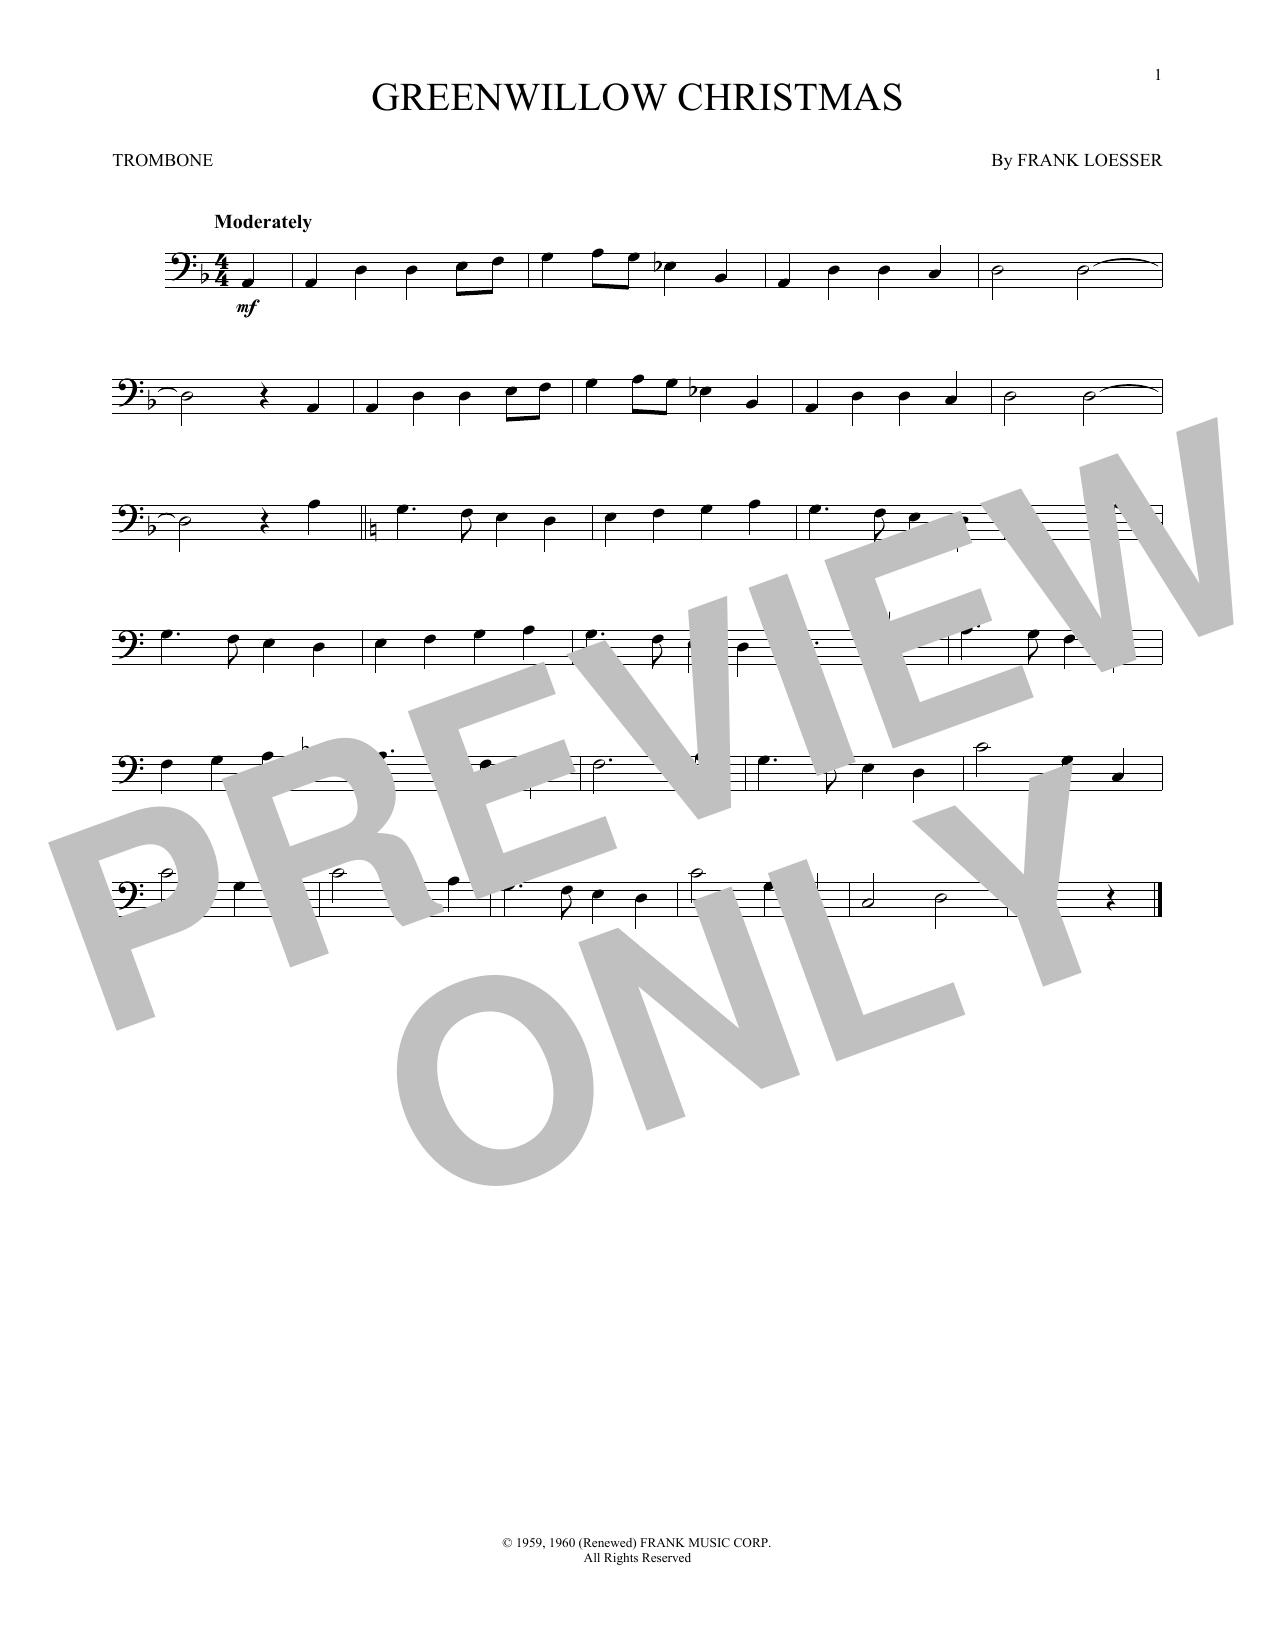 Greenwillow Christmas (Trombone Solo)